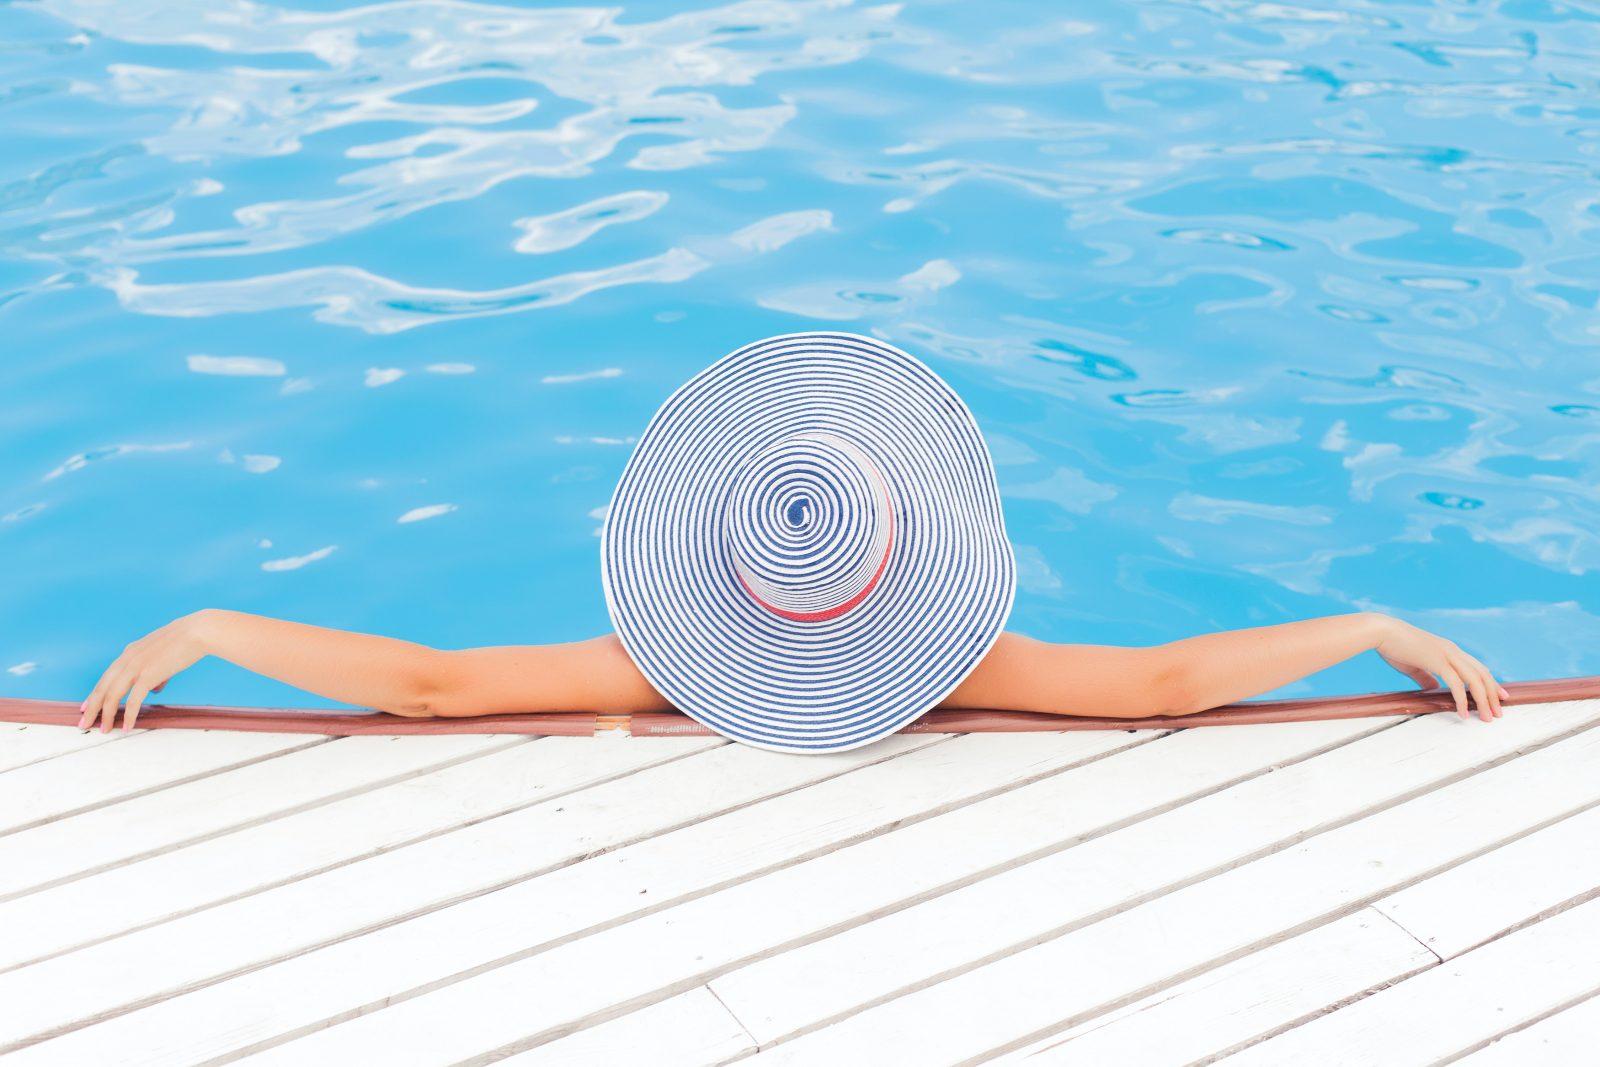 Anna Demianenko Unsplash image - enjoying summer